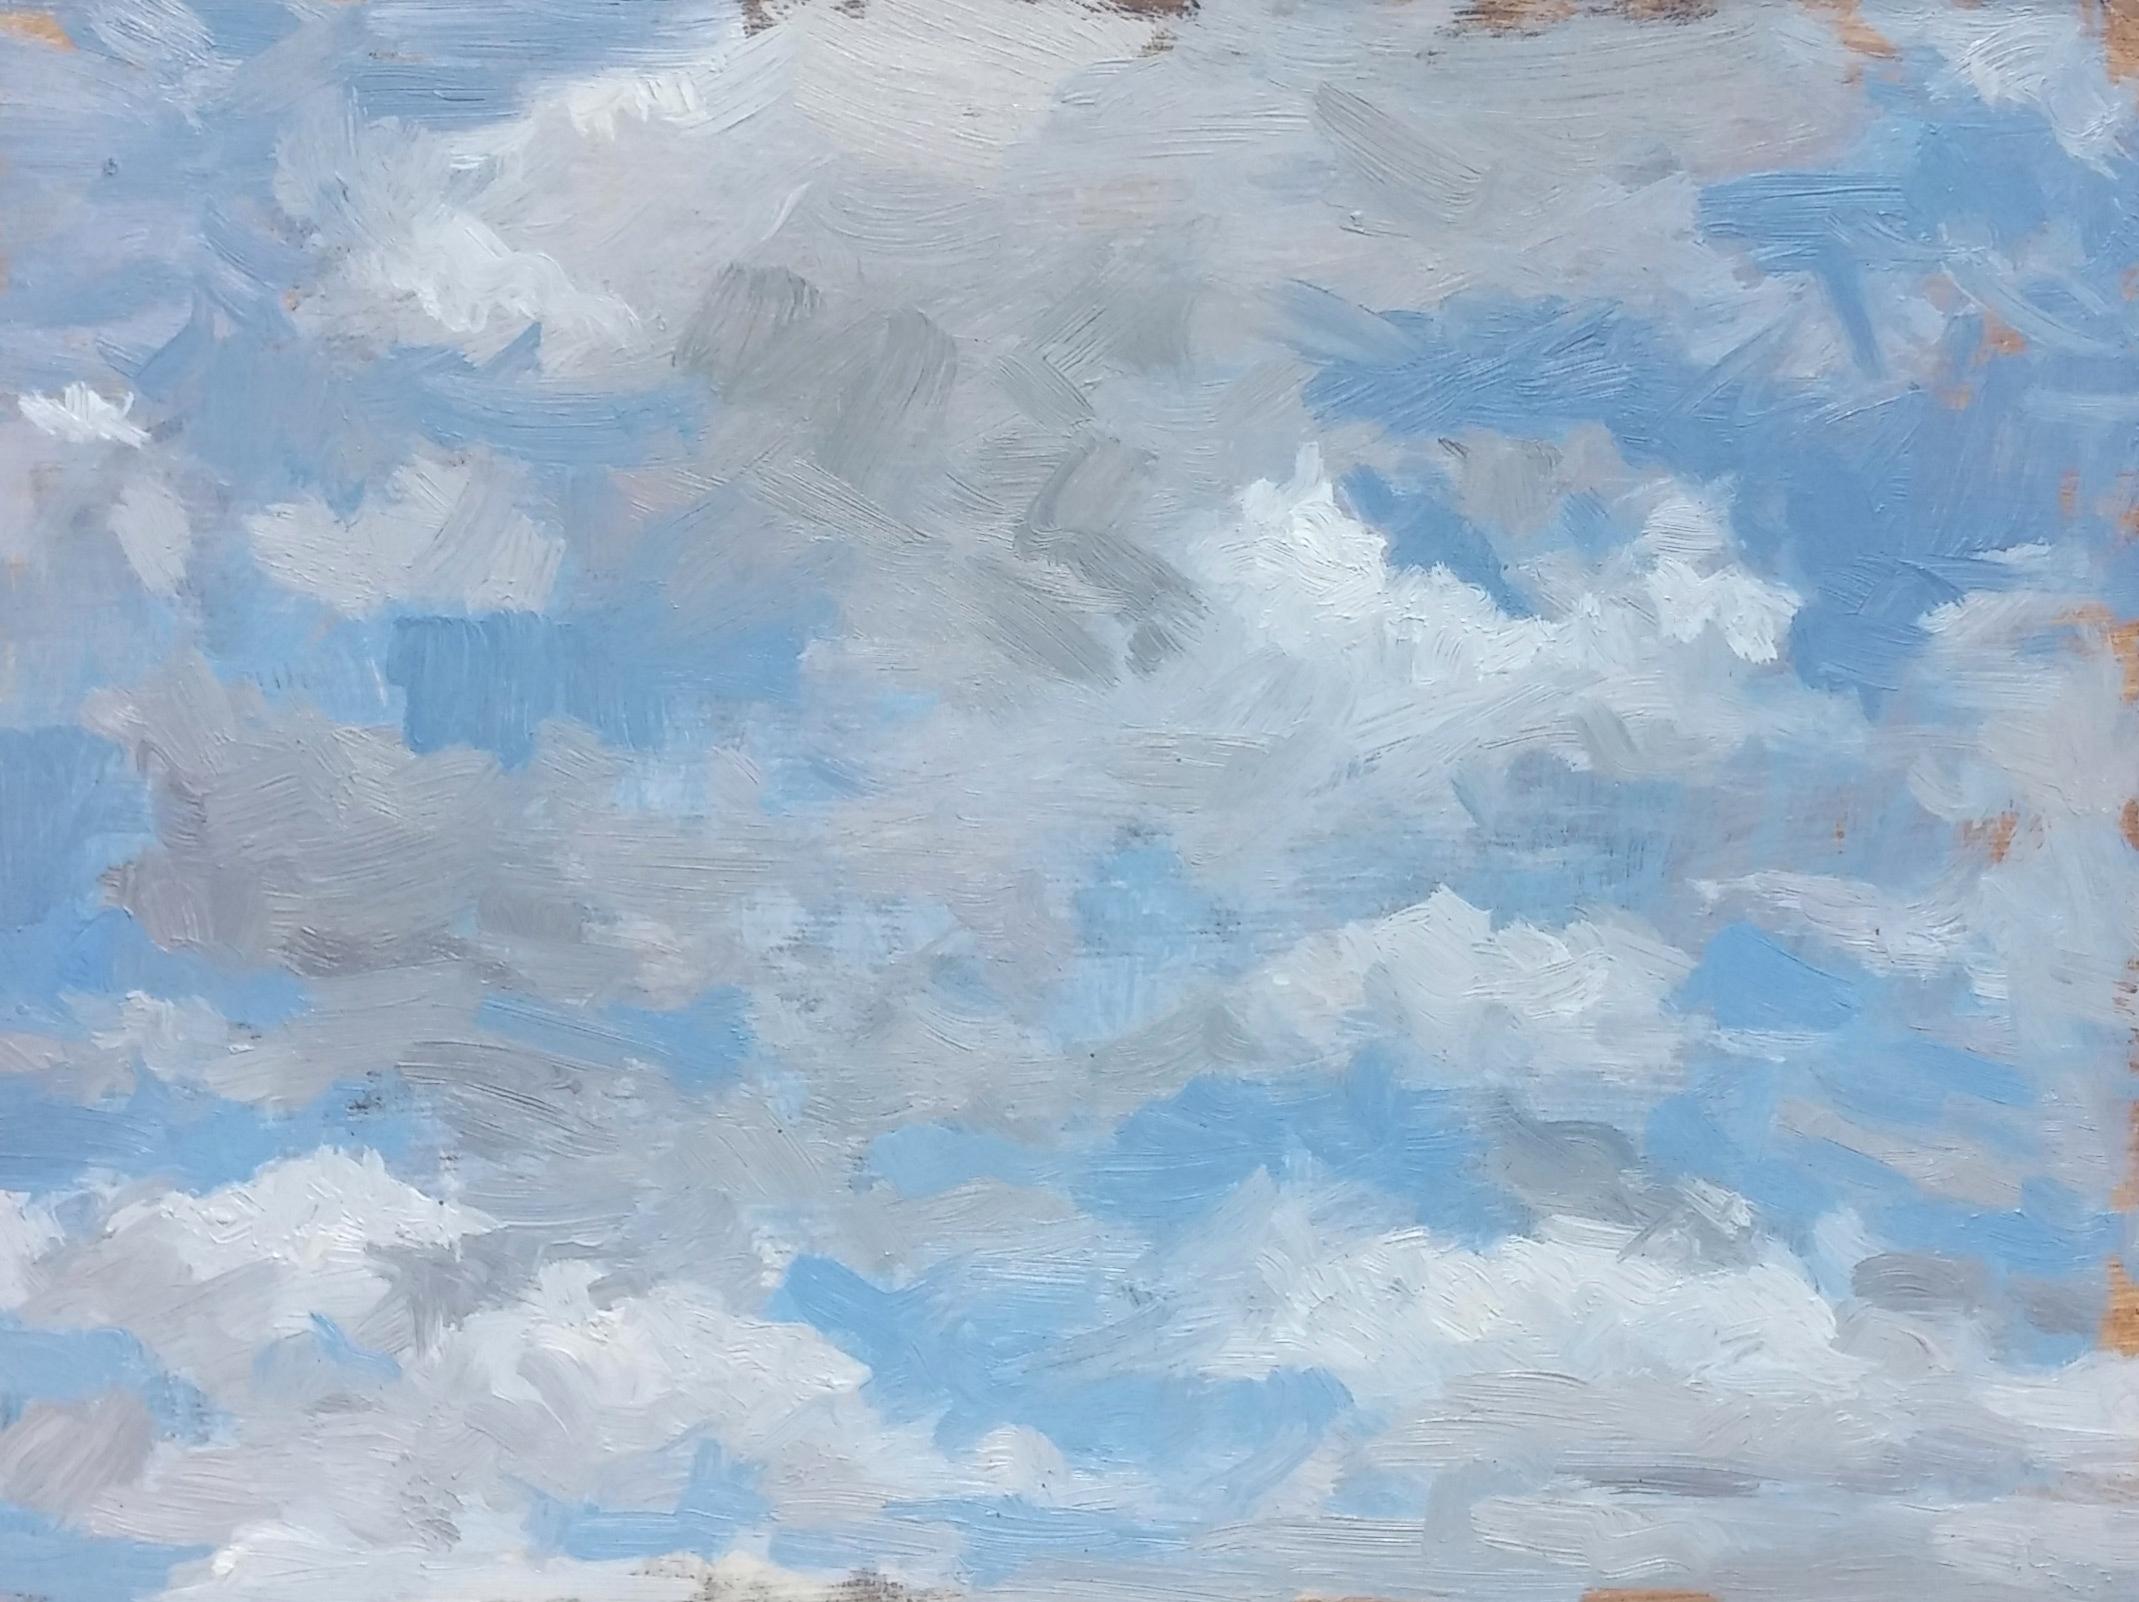 cloud-study.jpg